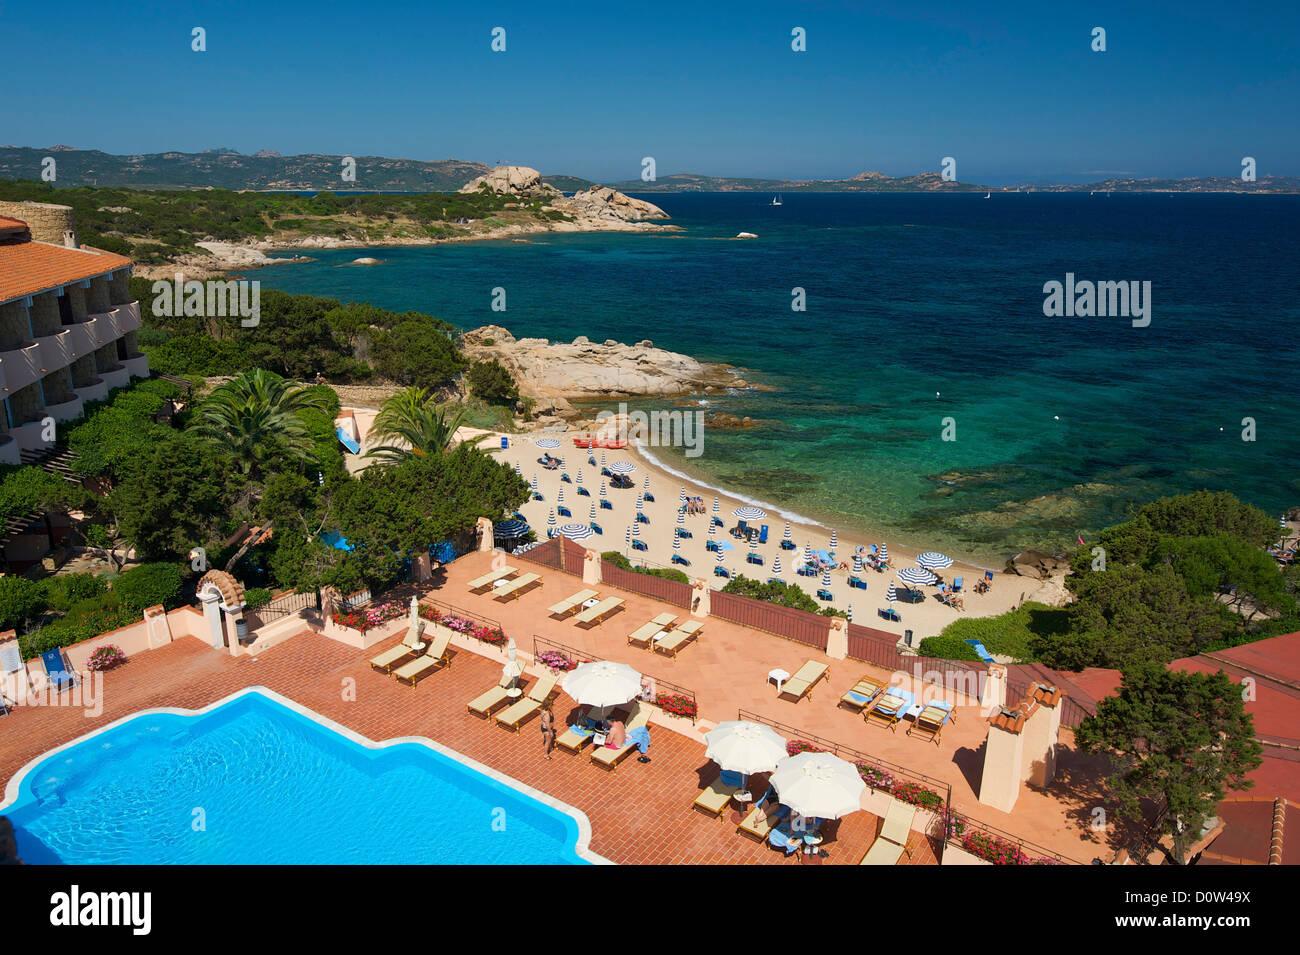 Grand Hotel Smeraldo Beach Porto Stockfotos Und Bilder Kaufen Alamy